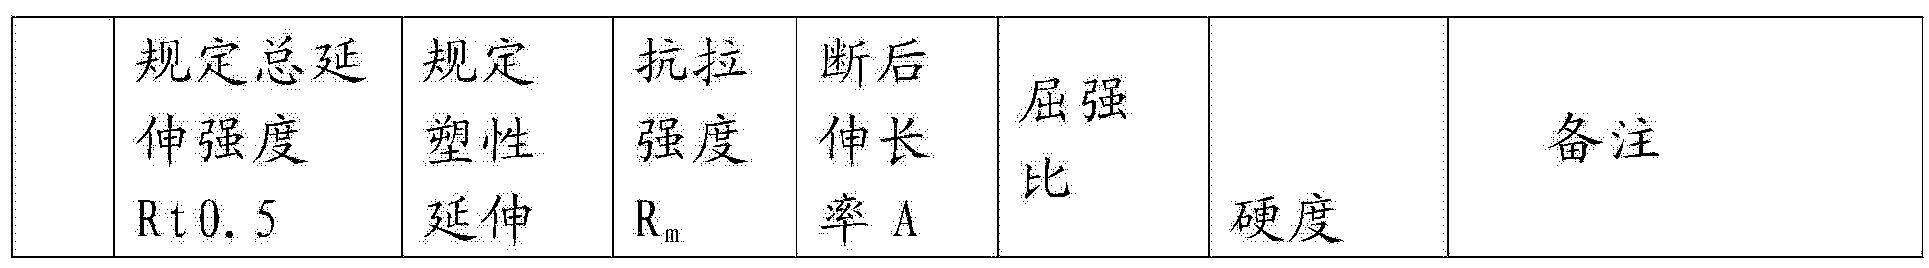 Figure CN104141099AD00062